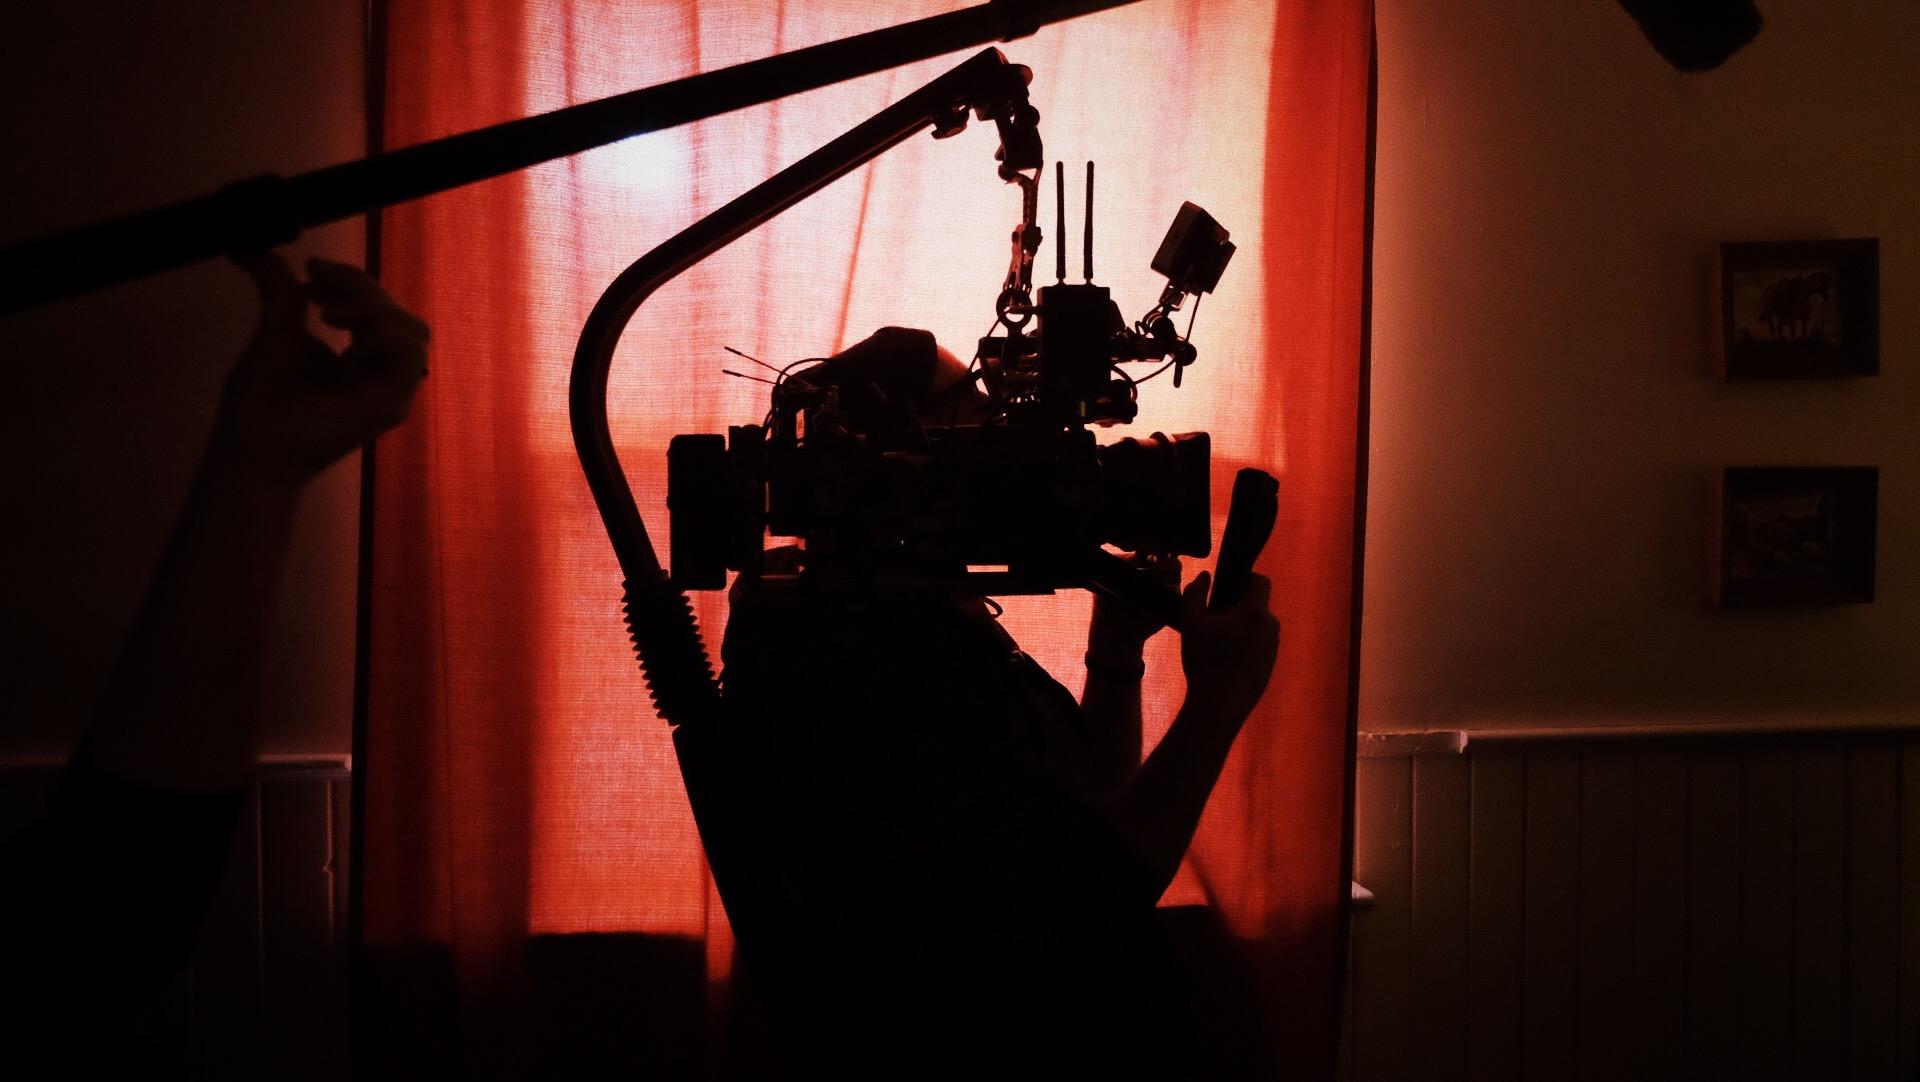 Nick Thomas (Director of Photography)